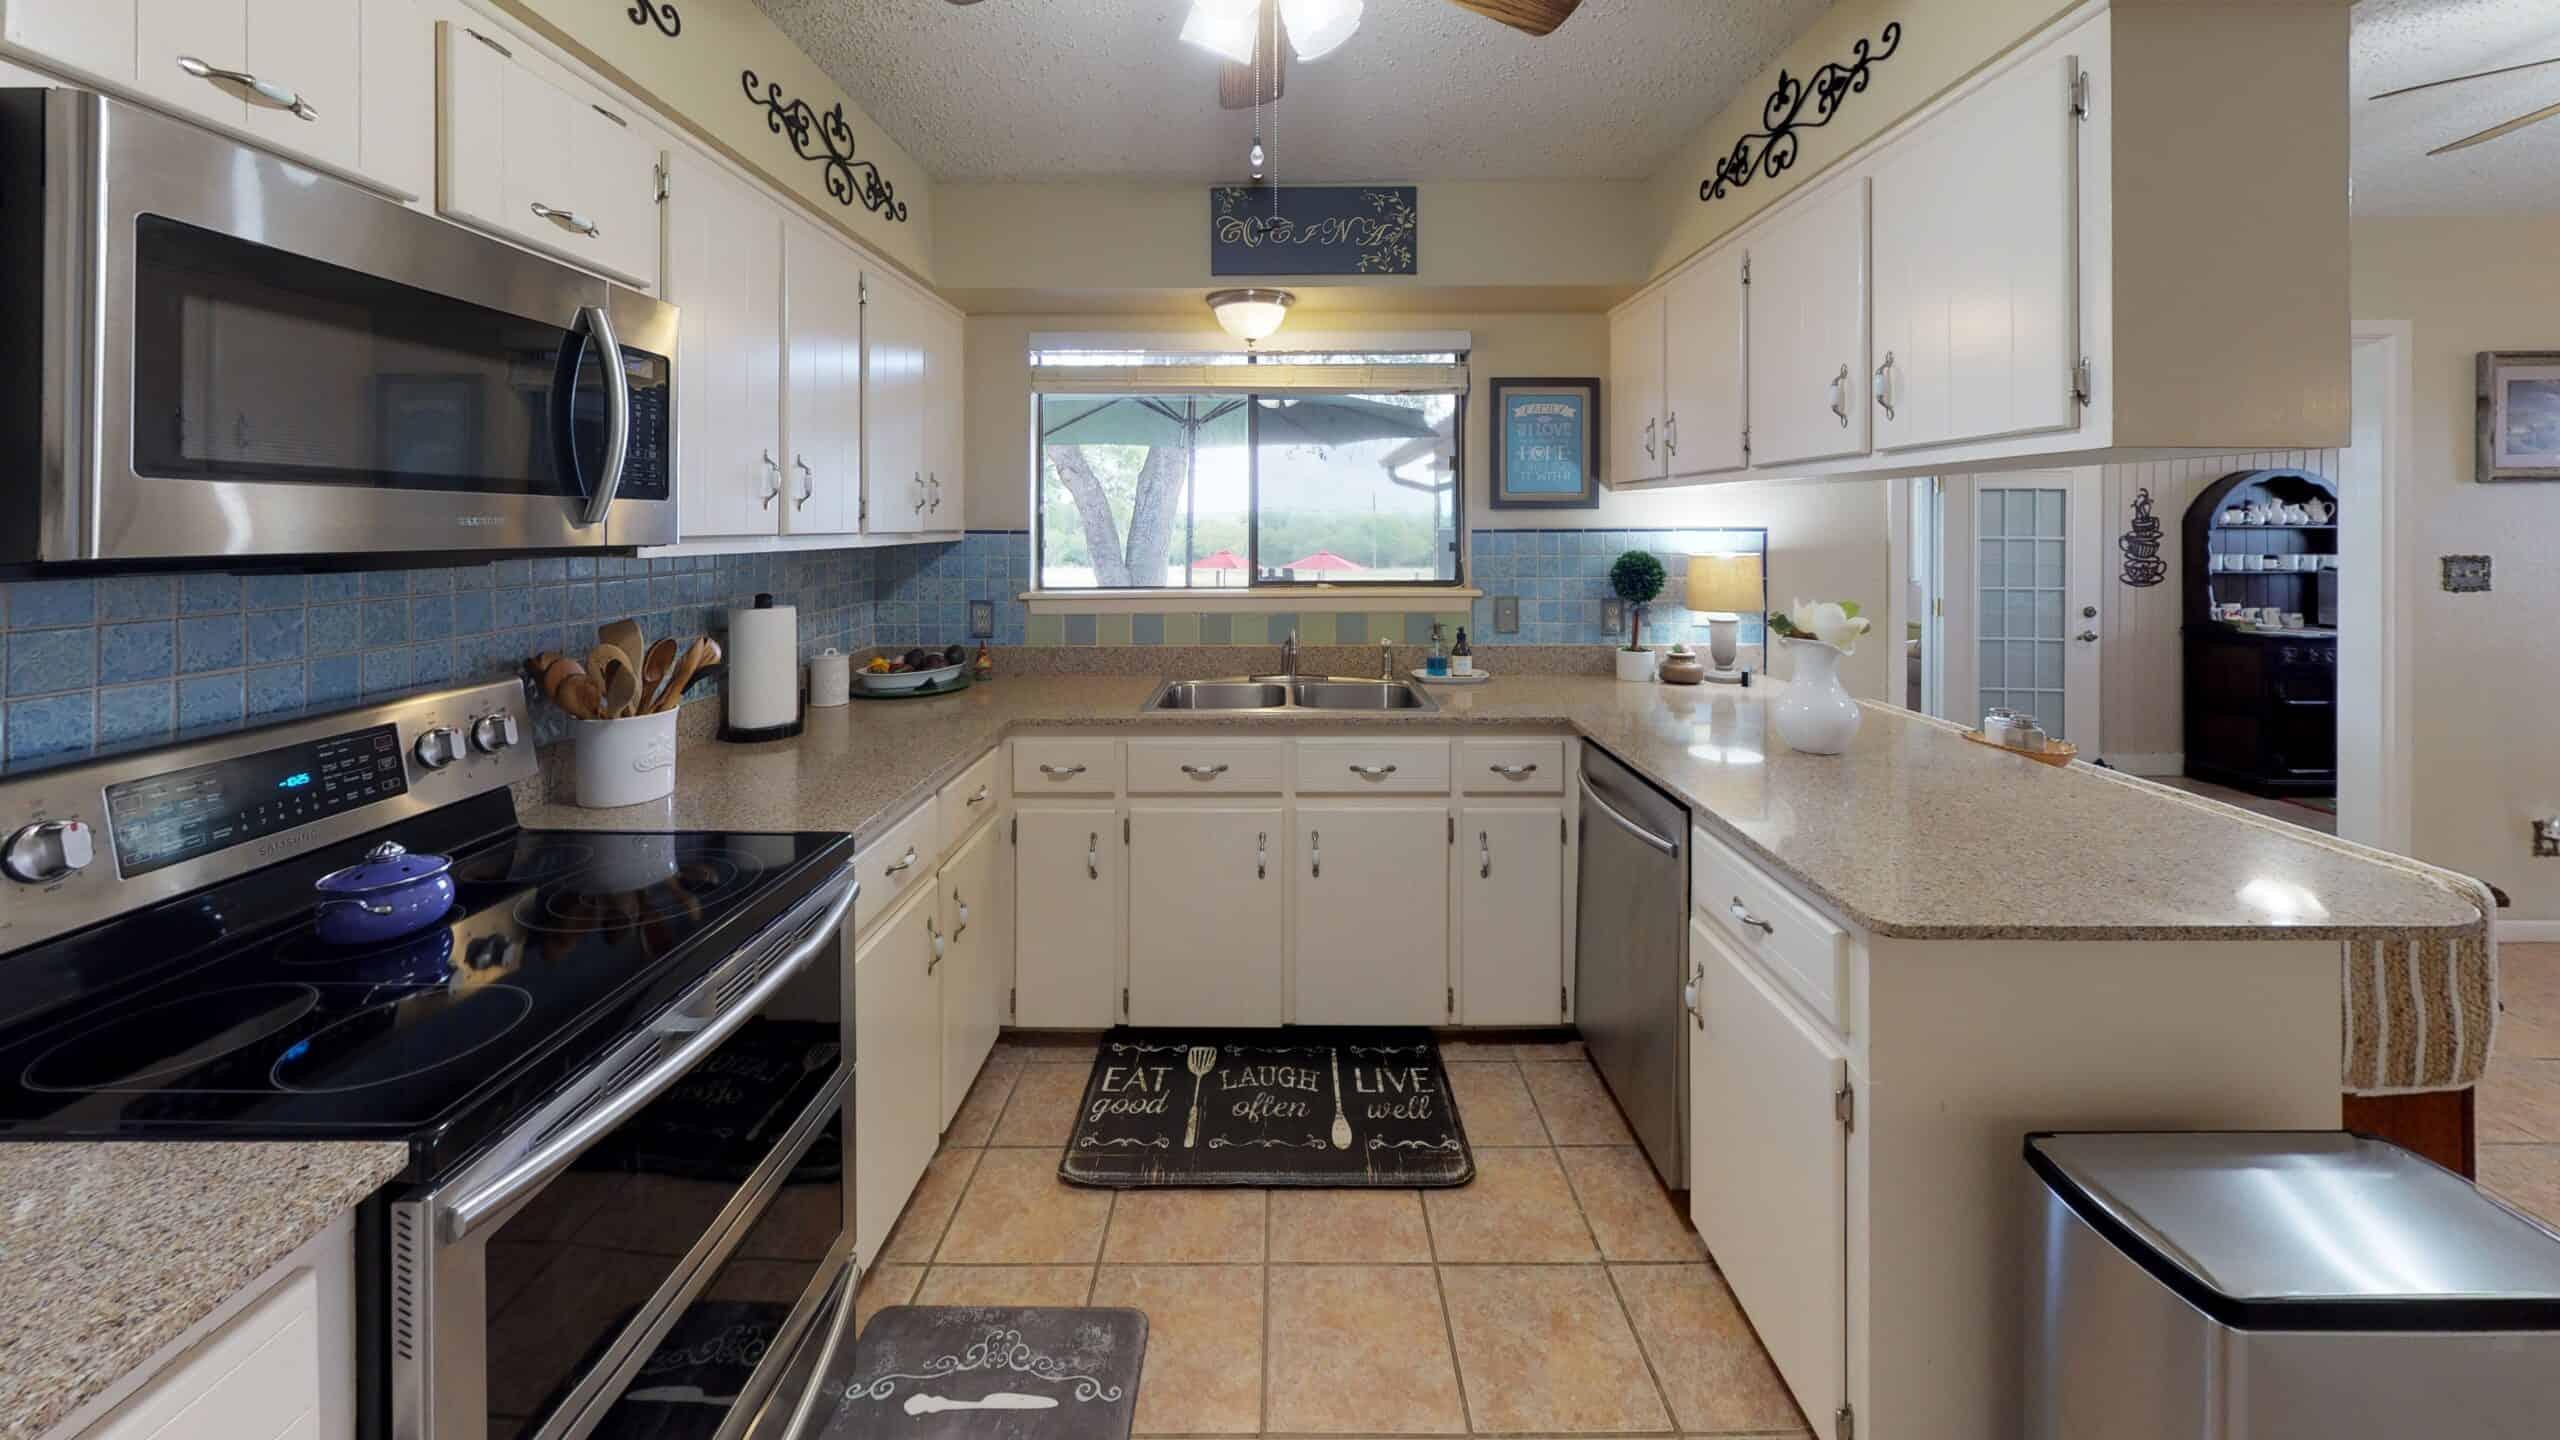 9645-FM-1726-Goliad-TX-77963-Kitchen